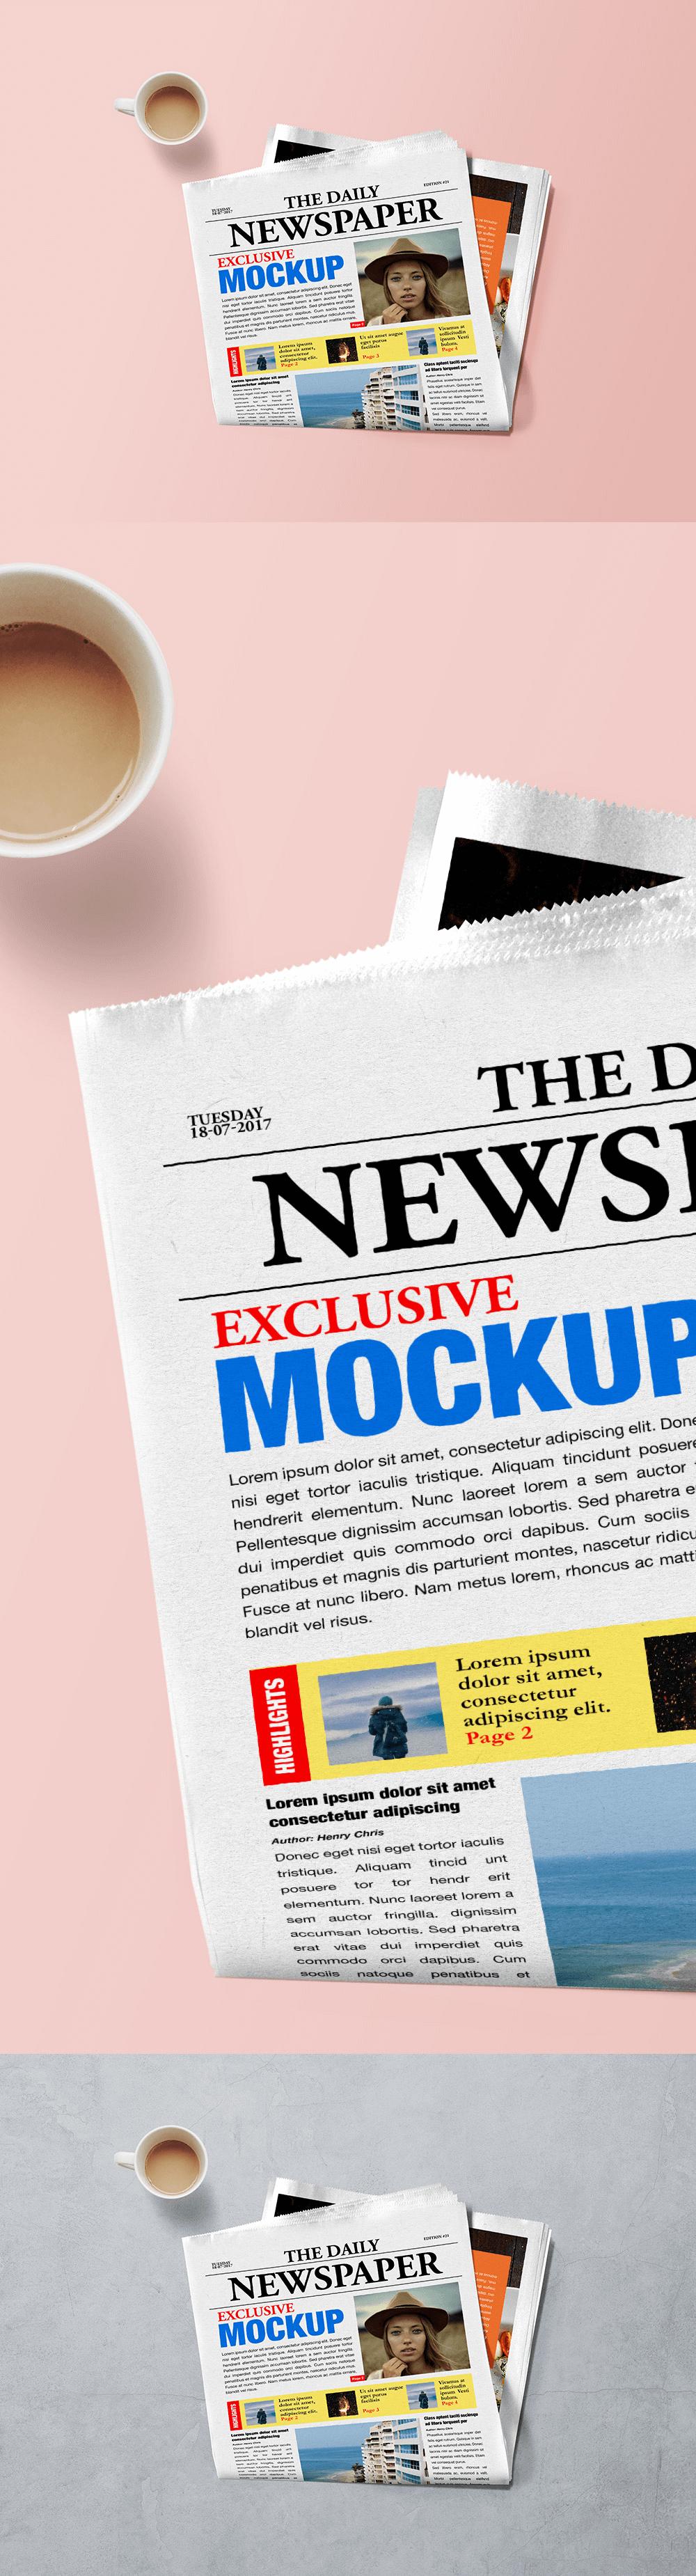 макет газеты. newspaper mockup